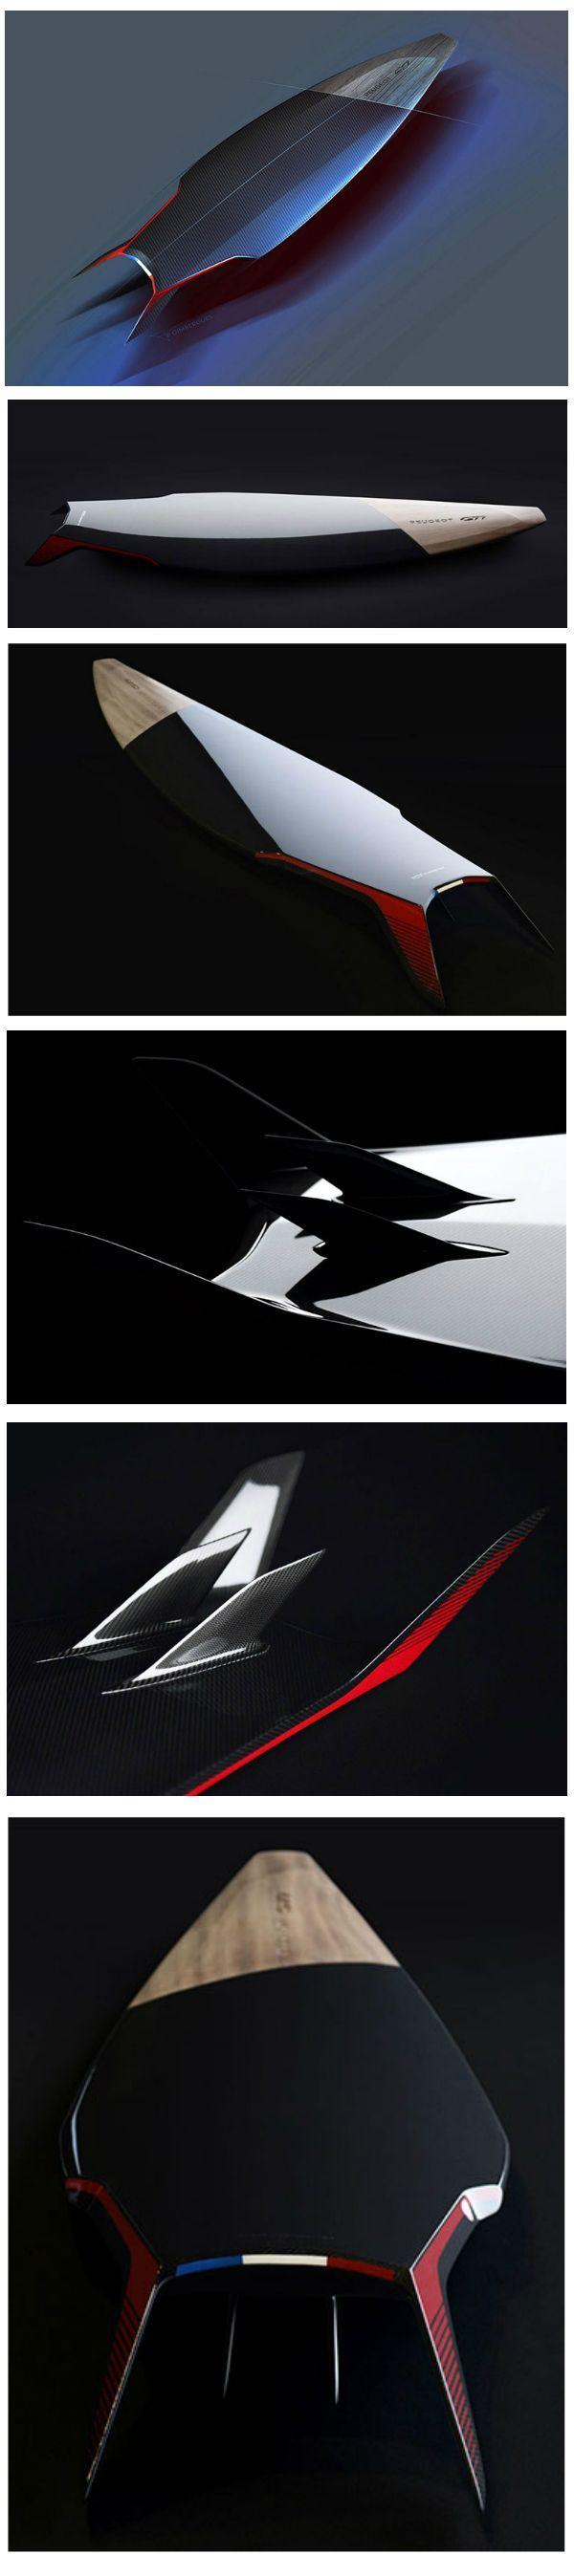 Carbon Surfboard Design by Peugeot